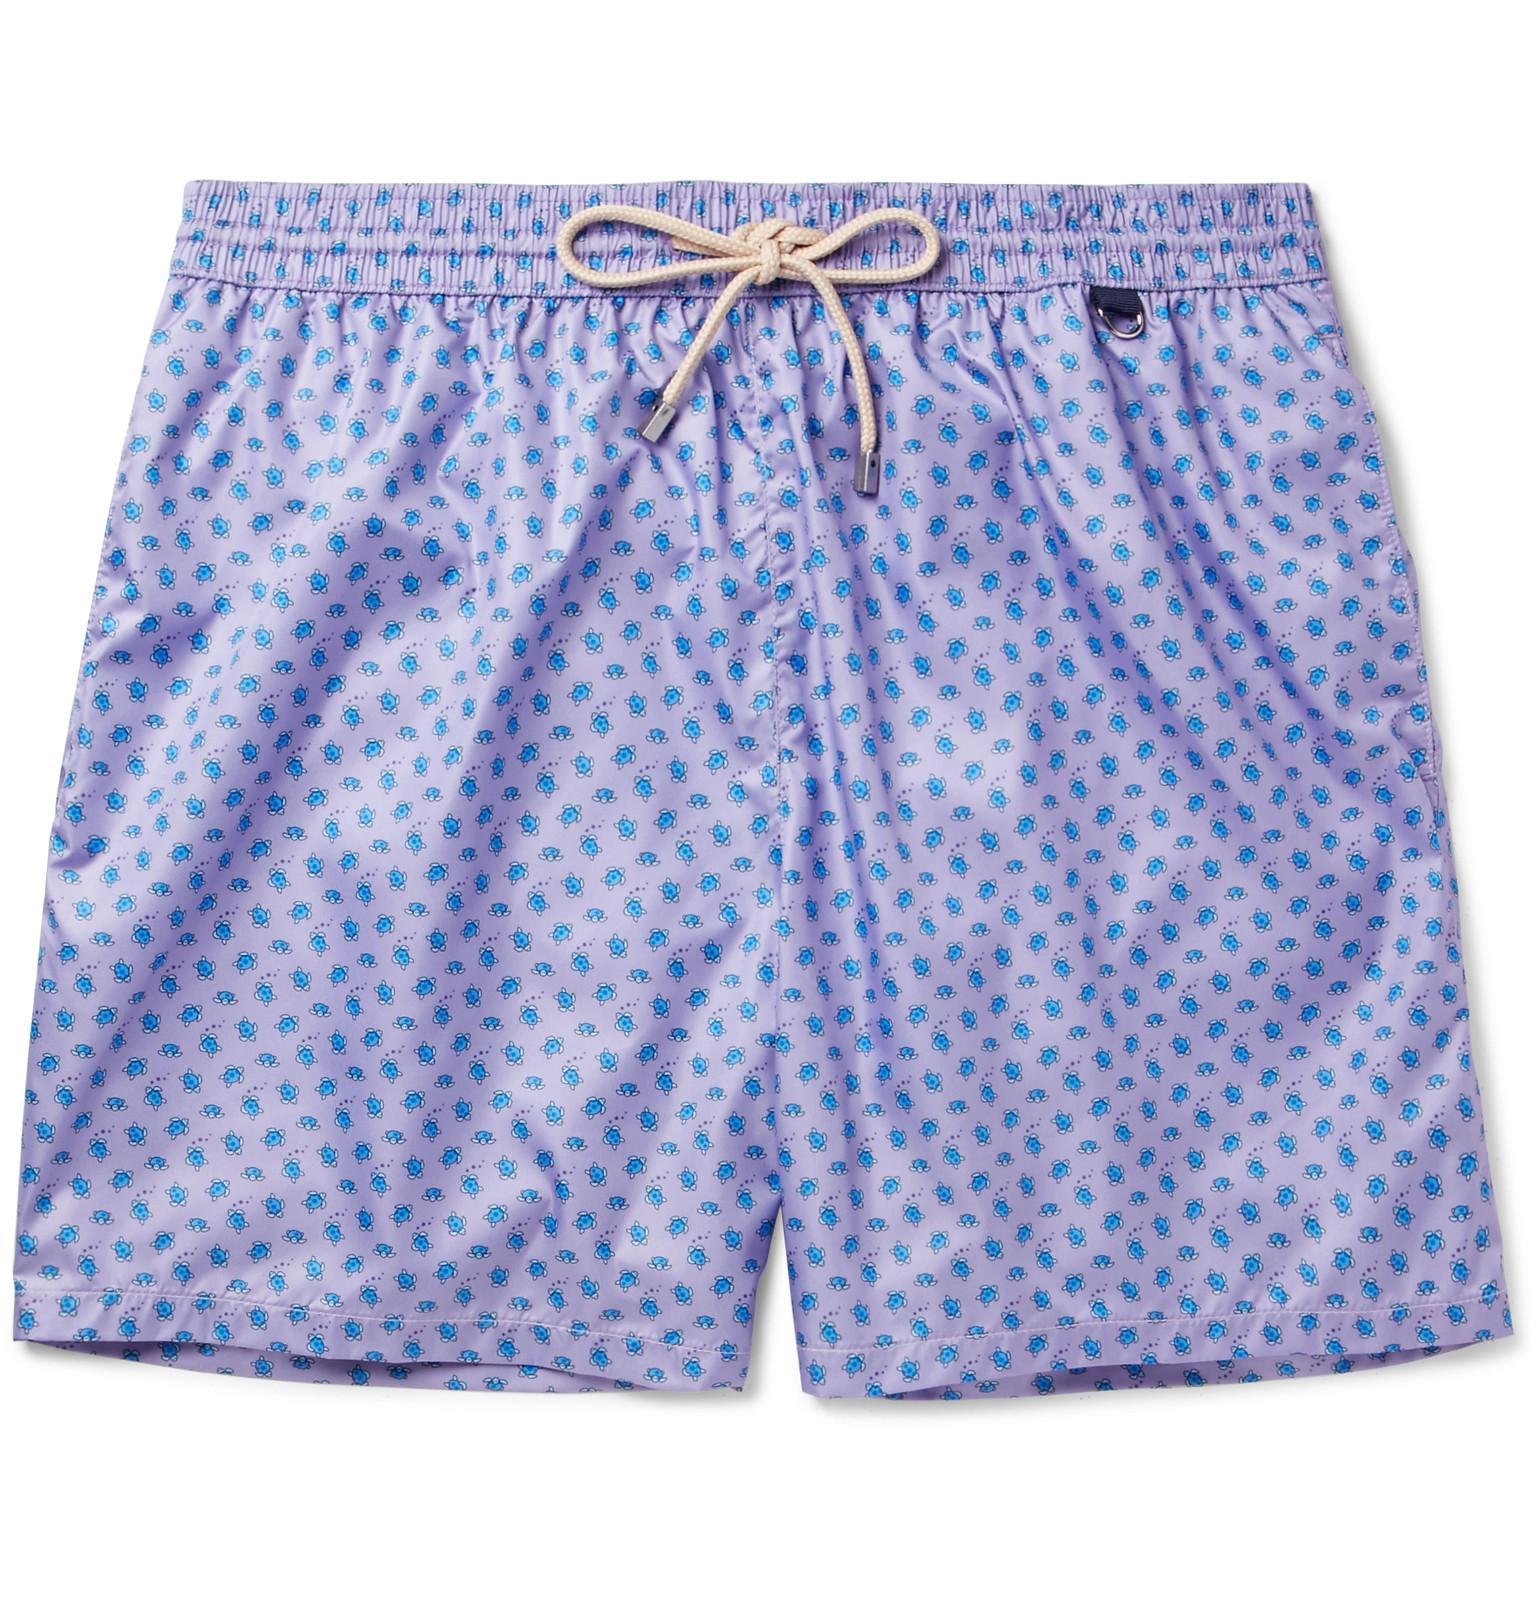 Mid-length Printed Swim Shorts Rubinacci Cheap Supply U3dcw2Bks